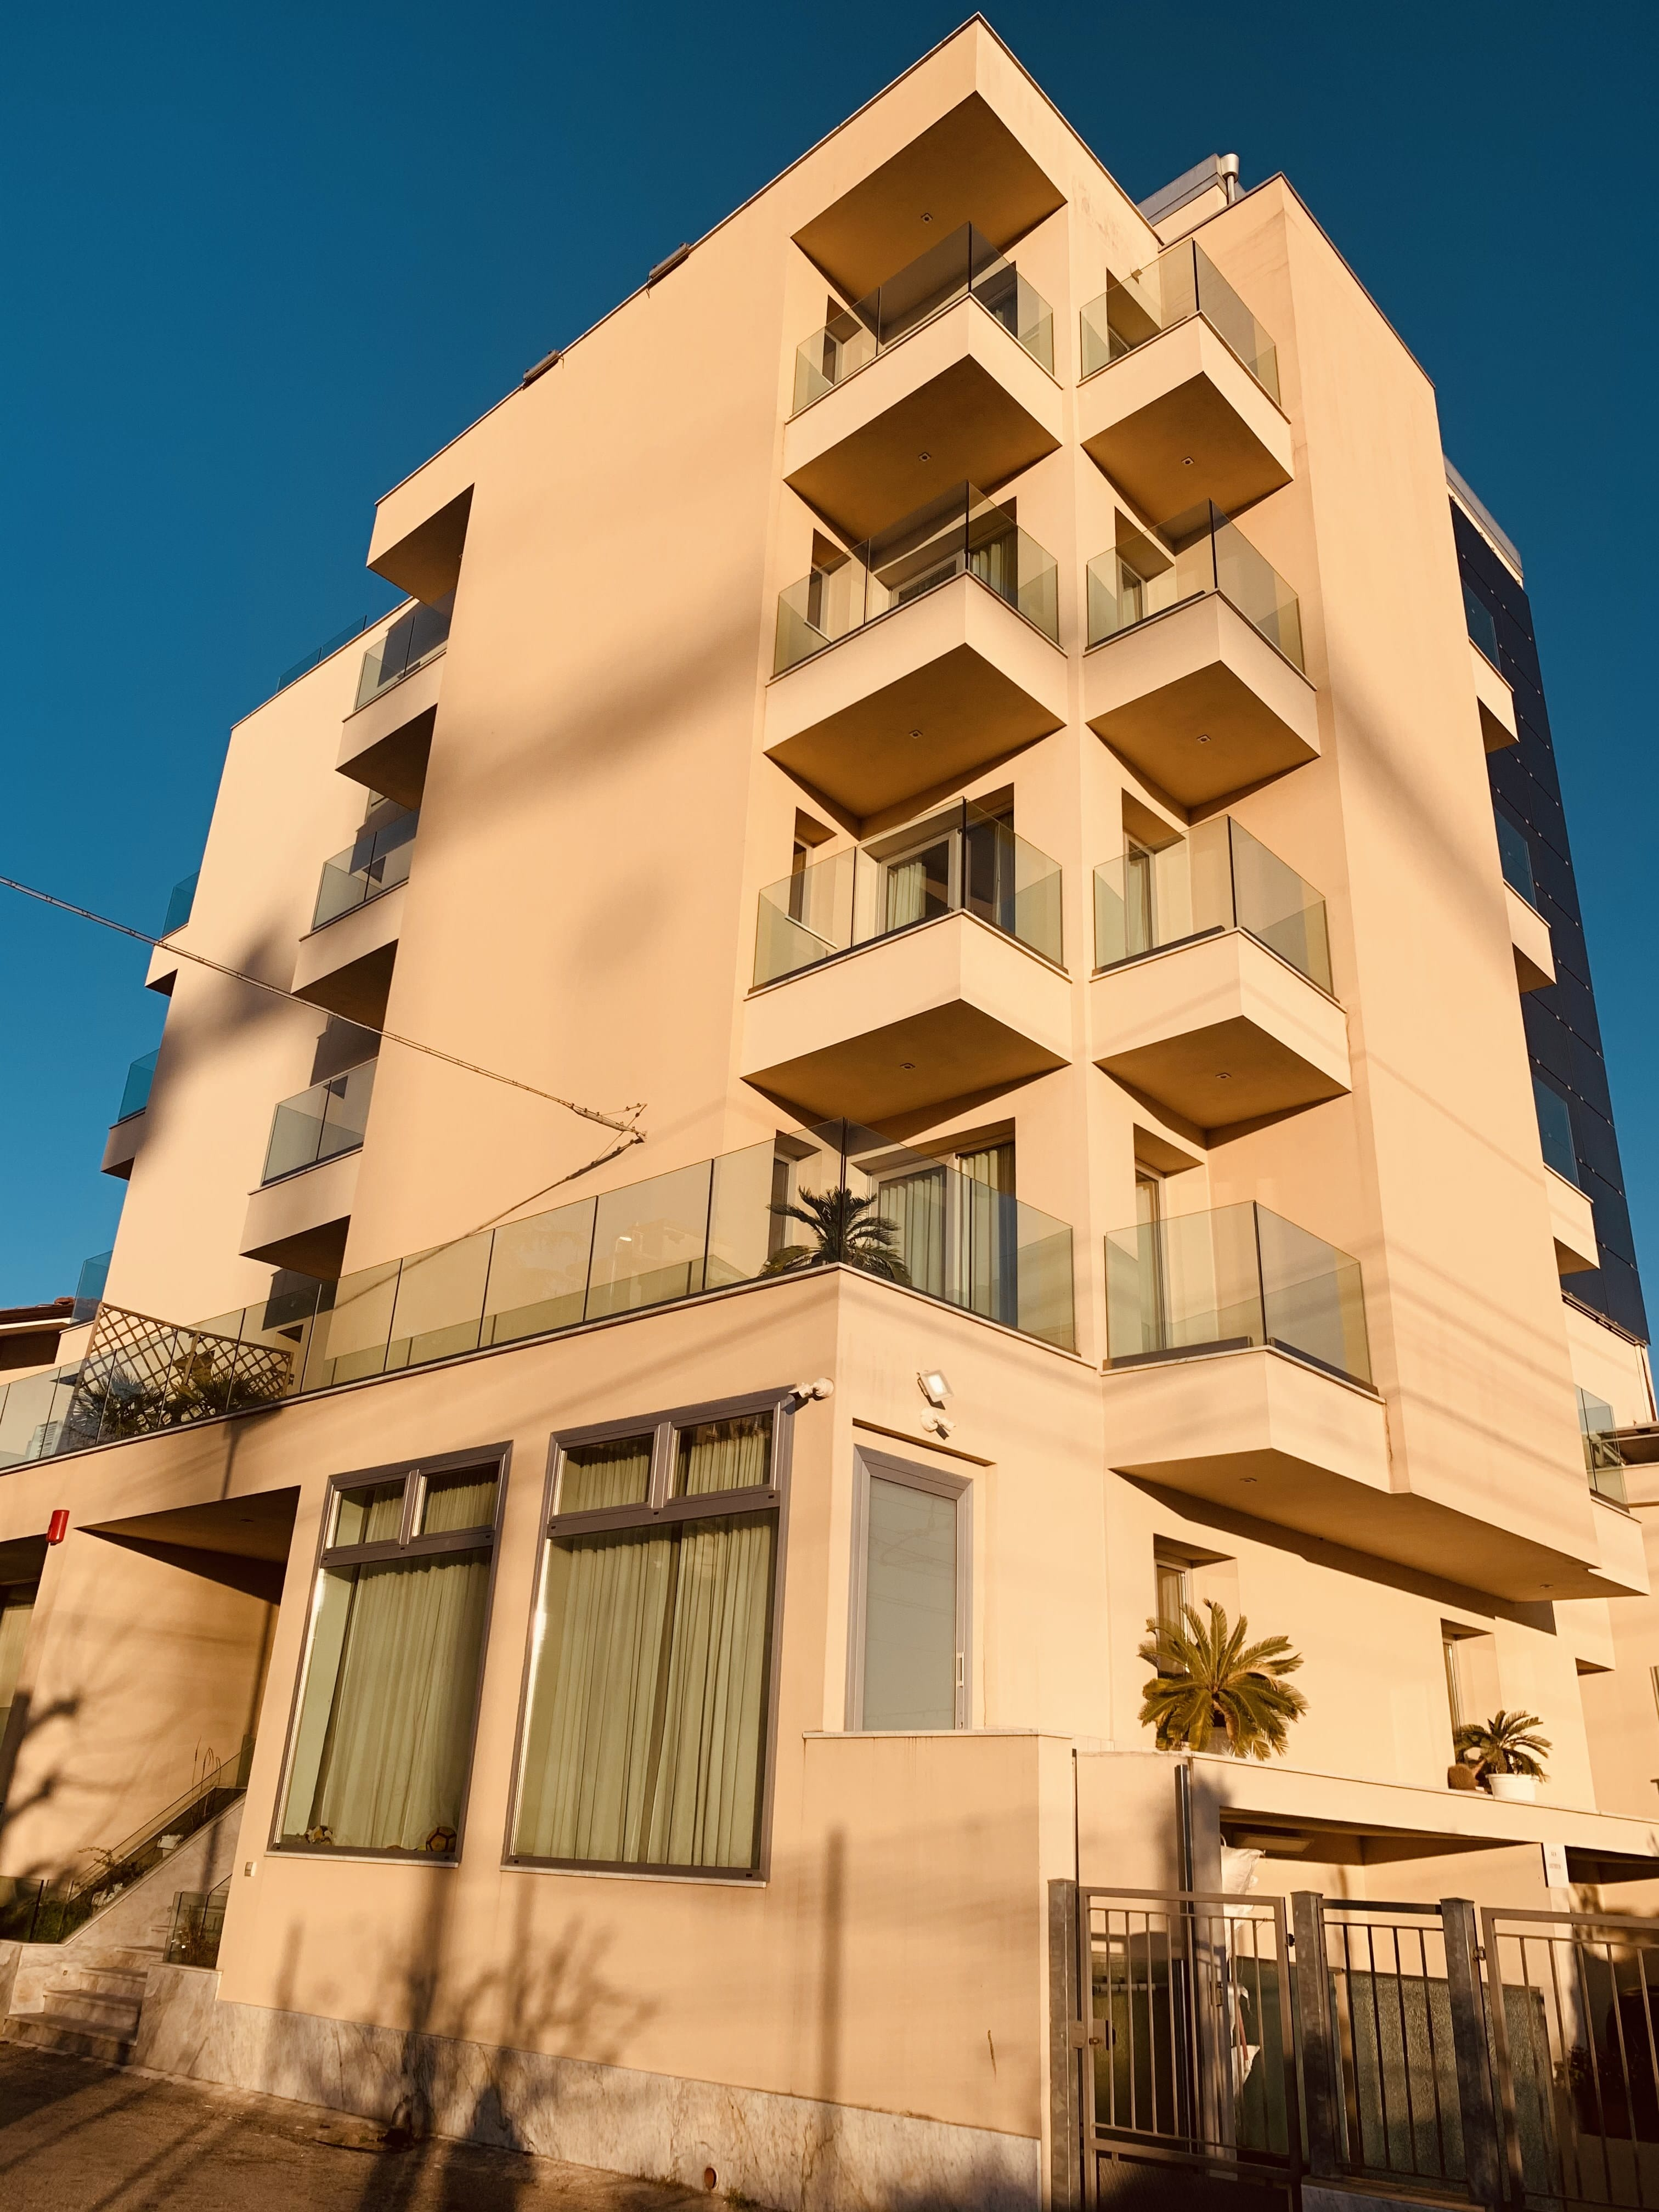 Albachiara residence Rimini